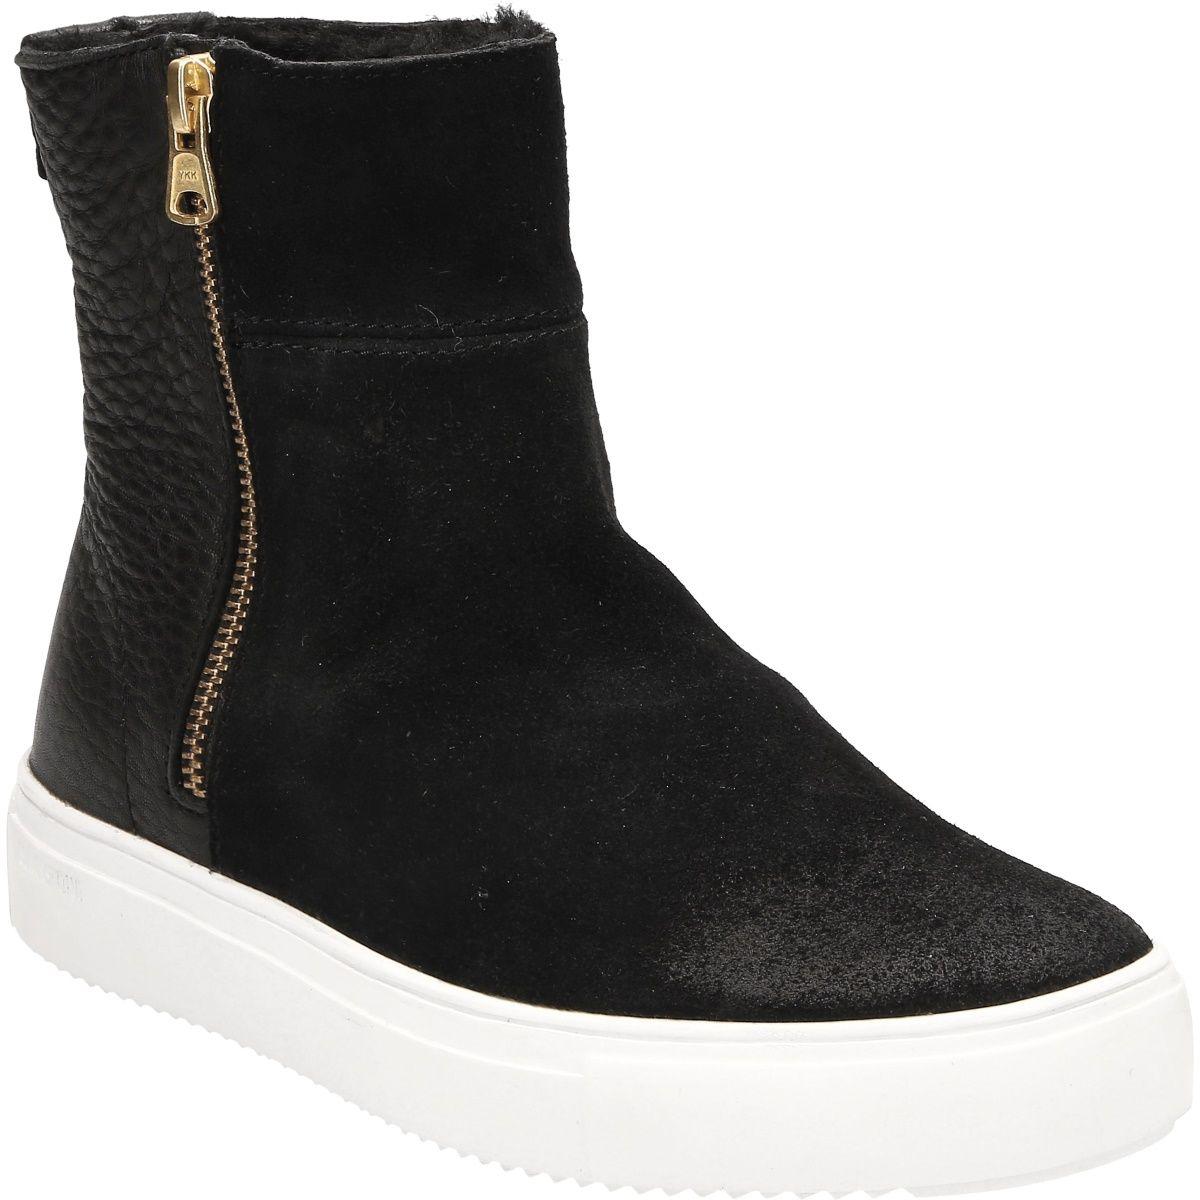 b4a4df4df516ad Blackstone QL49 BLACK Damenschuhe Stiefeletten im Schuhe Lüke Online ...